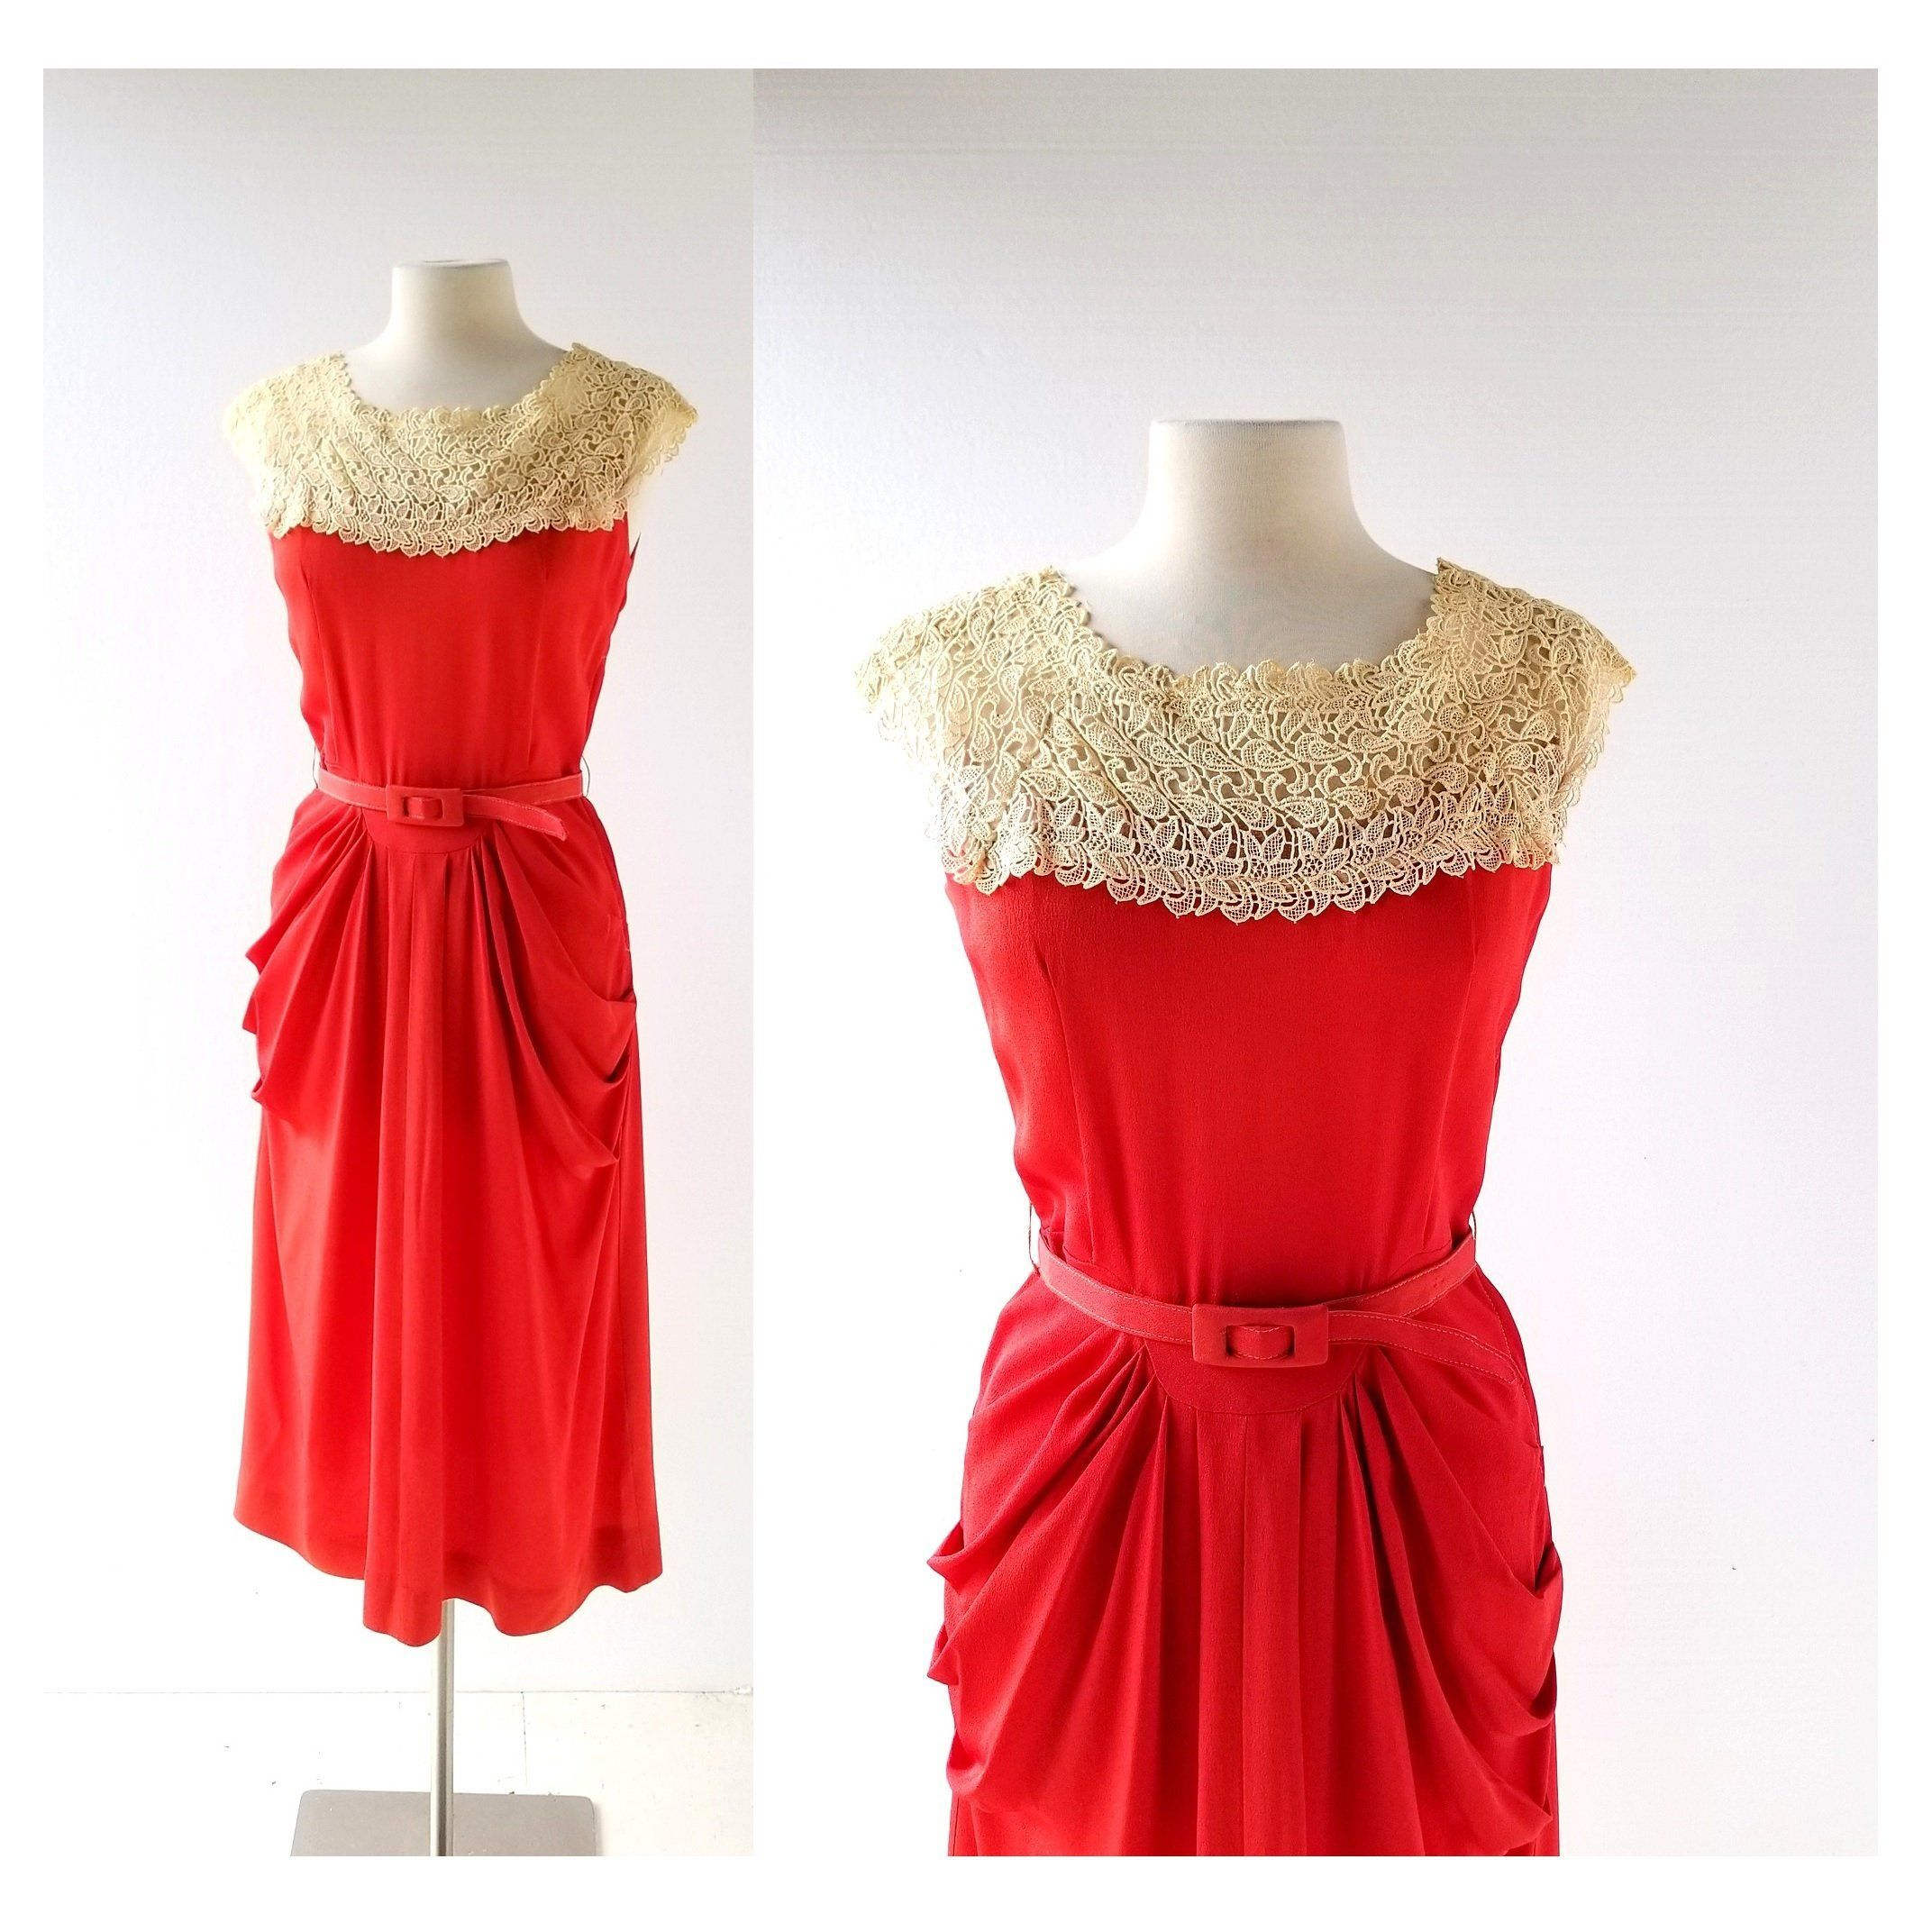 1940s Red Dress Lace Collar Dress 40s Dress S M Etsy Red Lace Dress Red Dress Collar Dress [ 2144 x 2144 Pixel ]